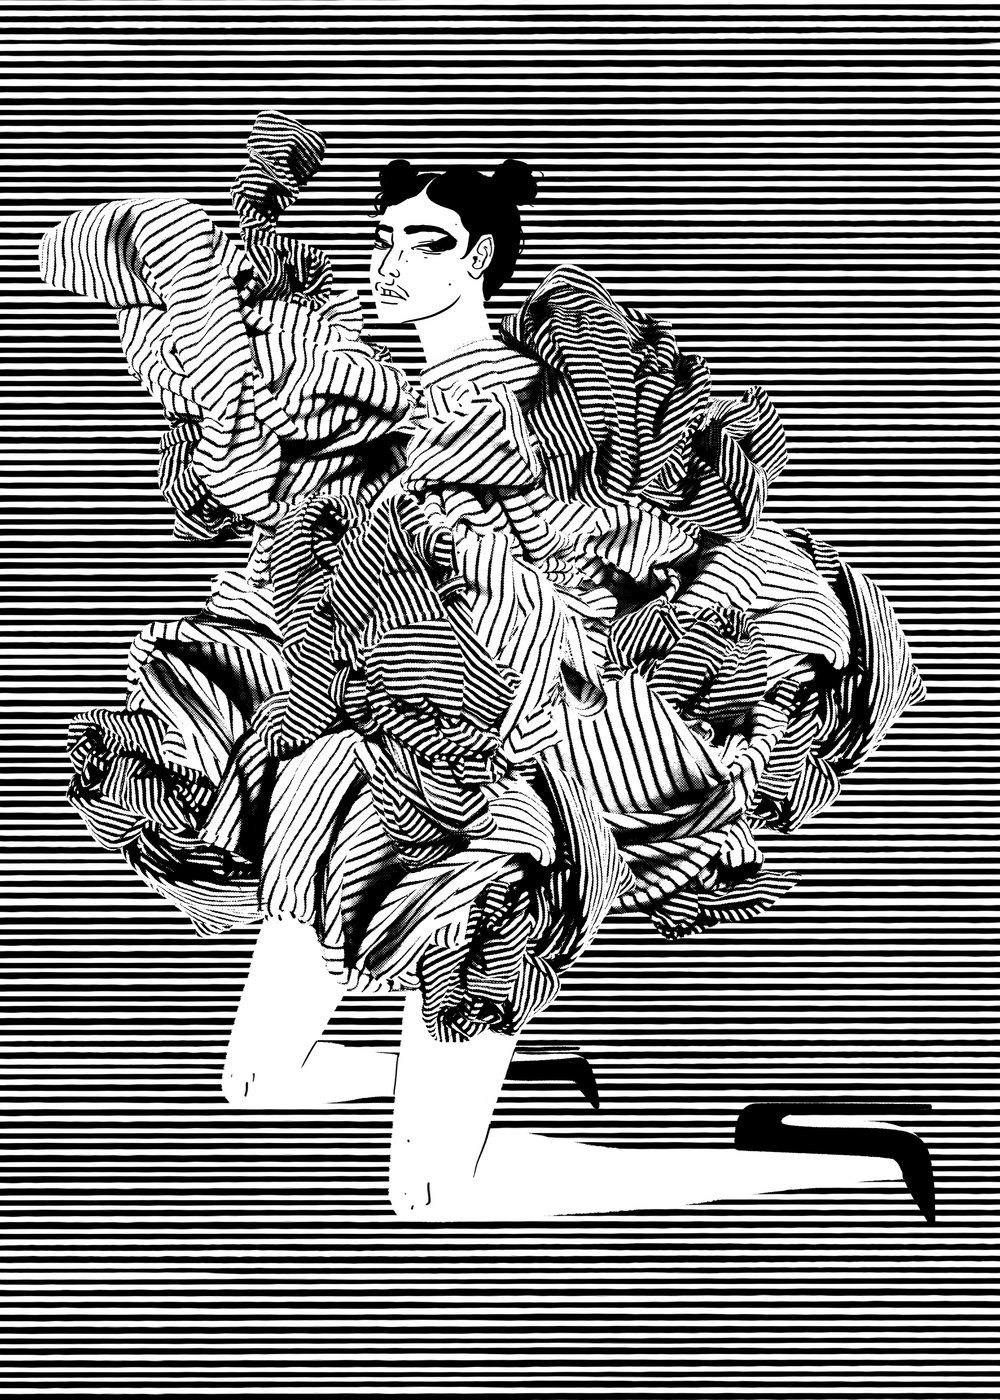 Dazzle Camouflage_3x3.jpg